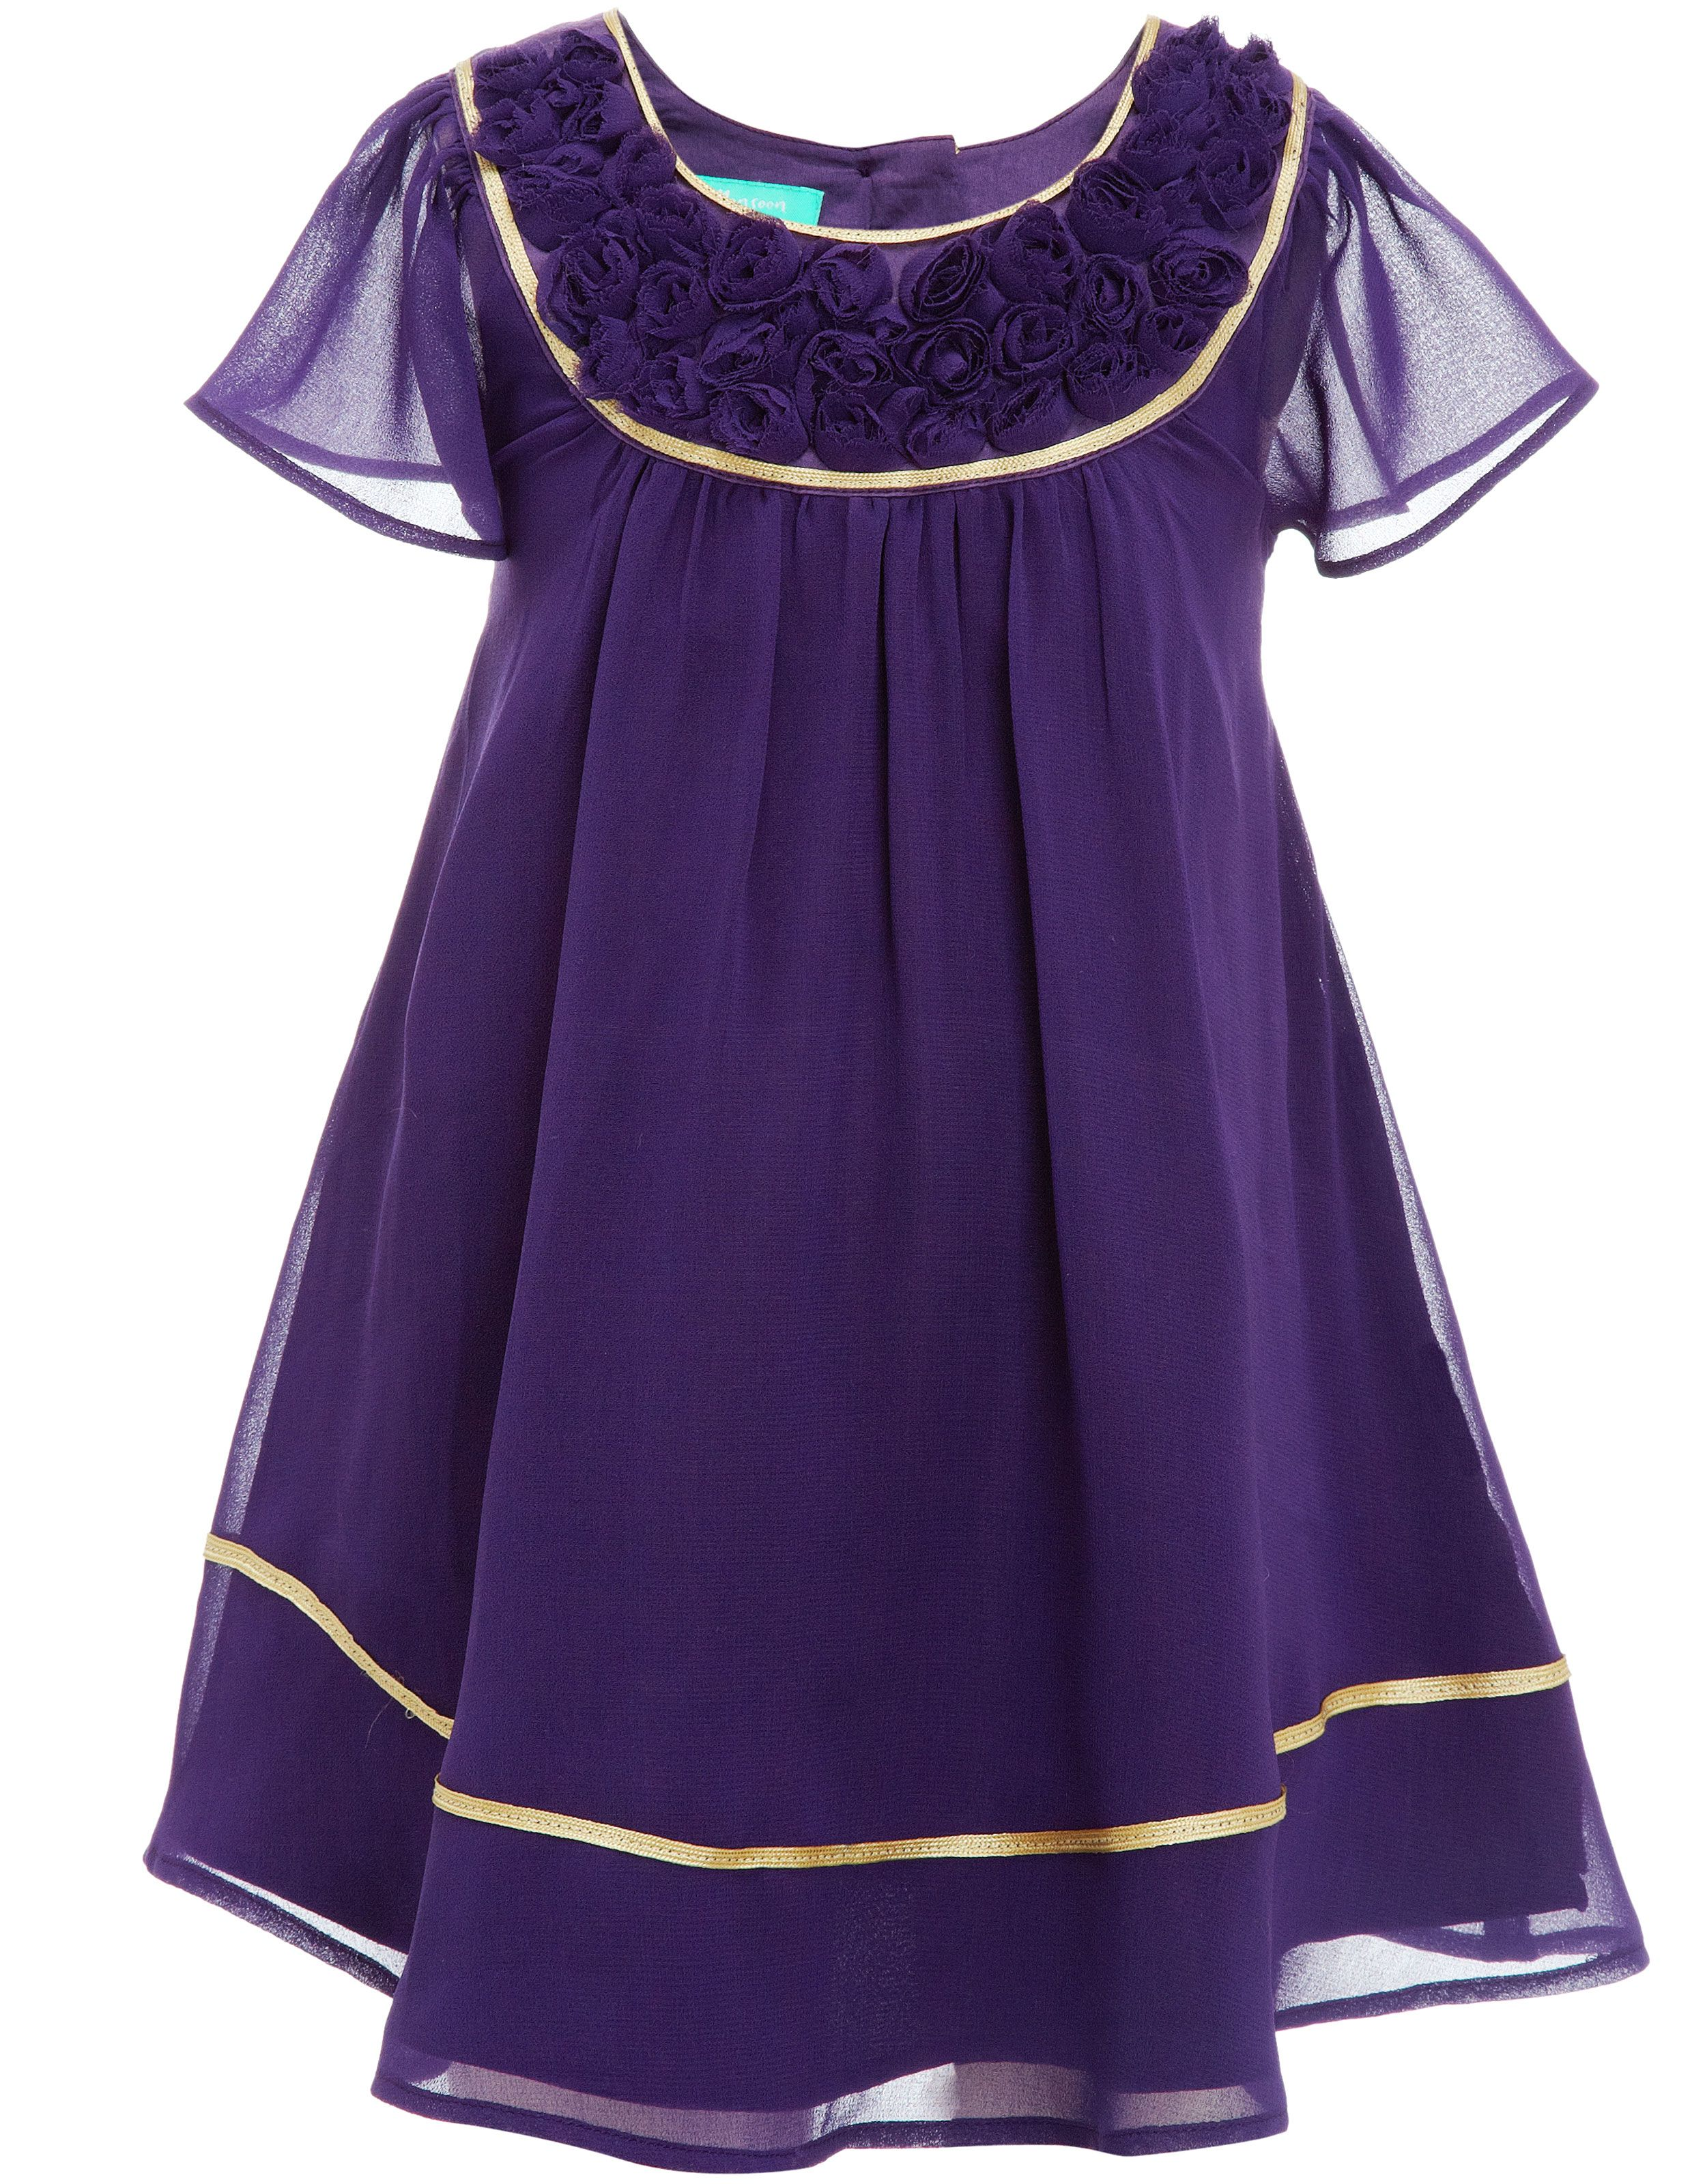 Baby Jasmine Short Sleeved Dress | Layla | Pinterest | Short sleeve ...